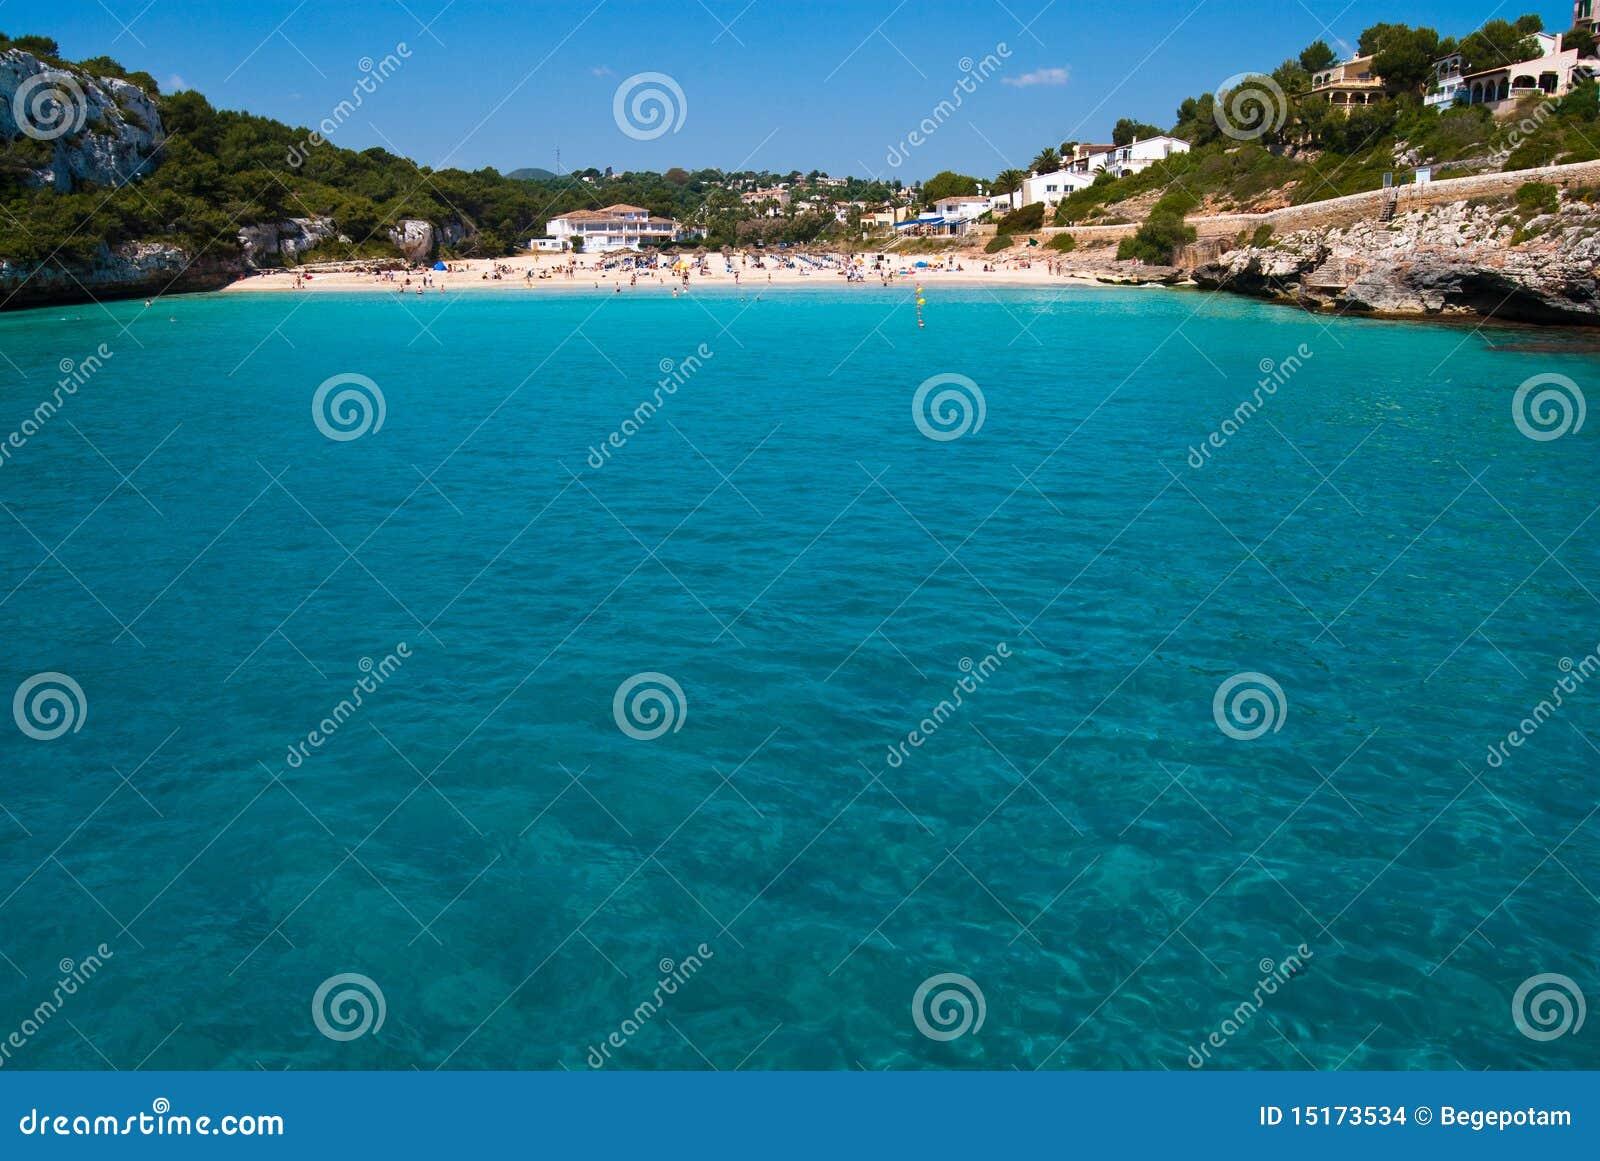 Cala Romantica Spain  City new picture : The Beach Of Cala Romantica, Majorca, Spain Stock Images Image ...